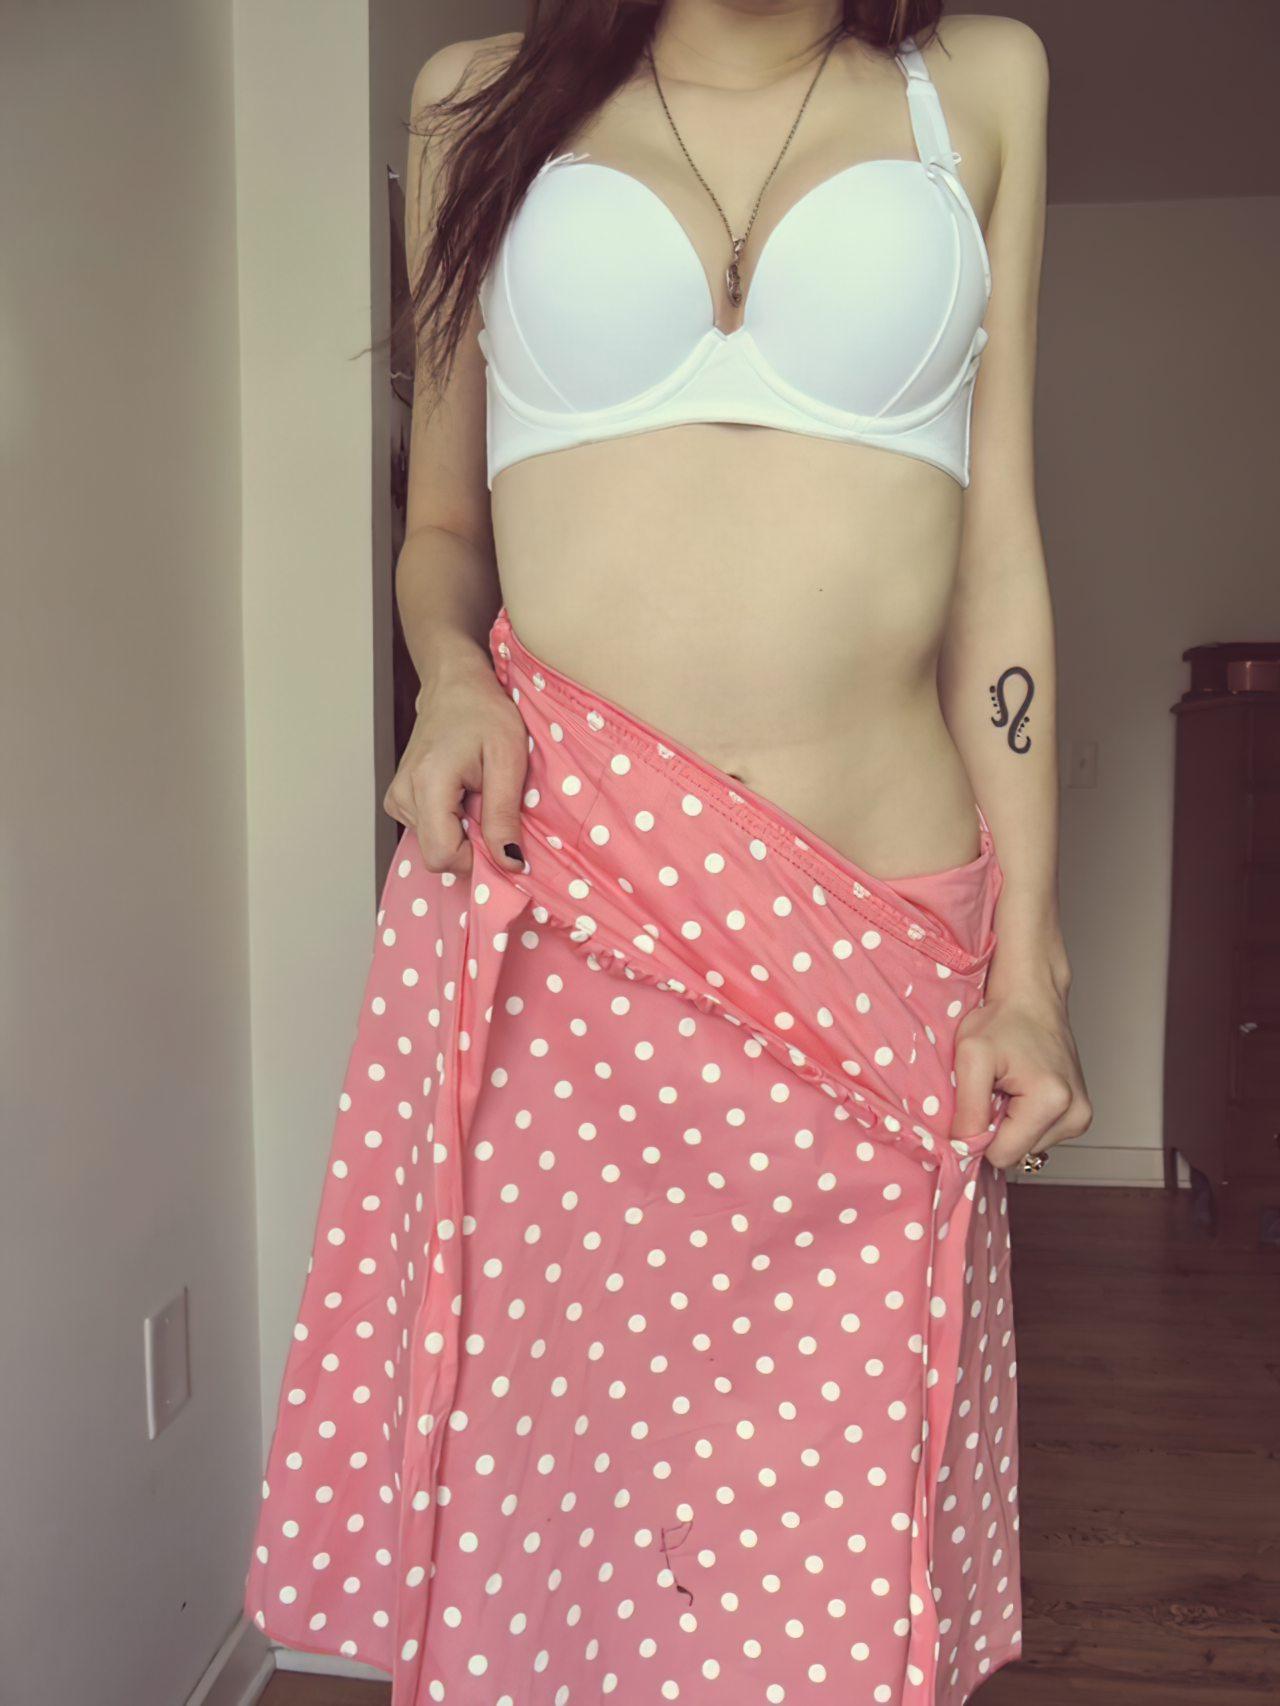 Gatinha Despindo o Vestido (2)